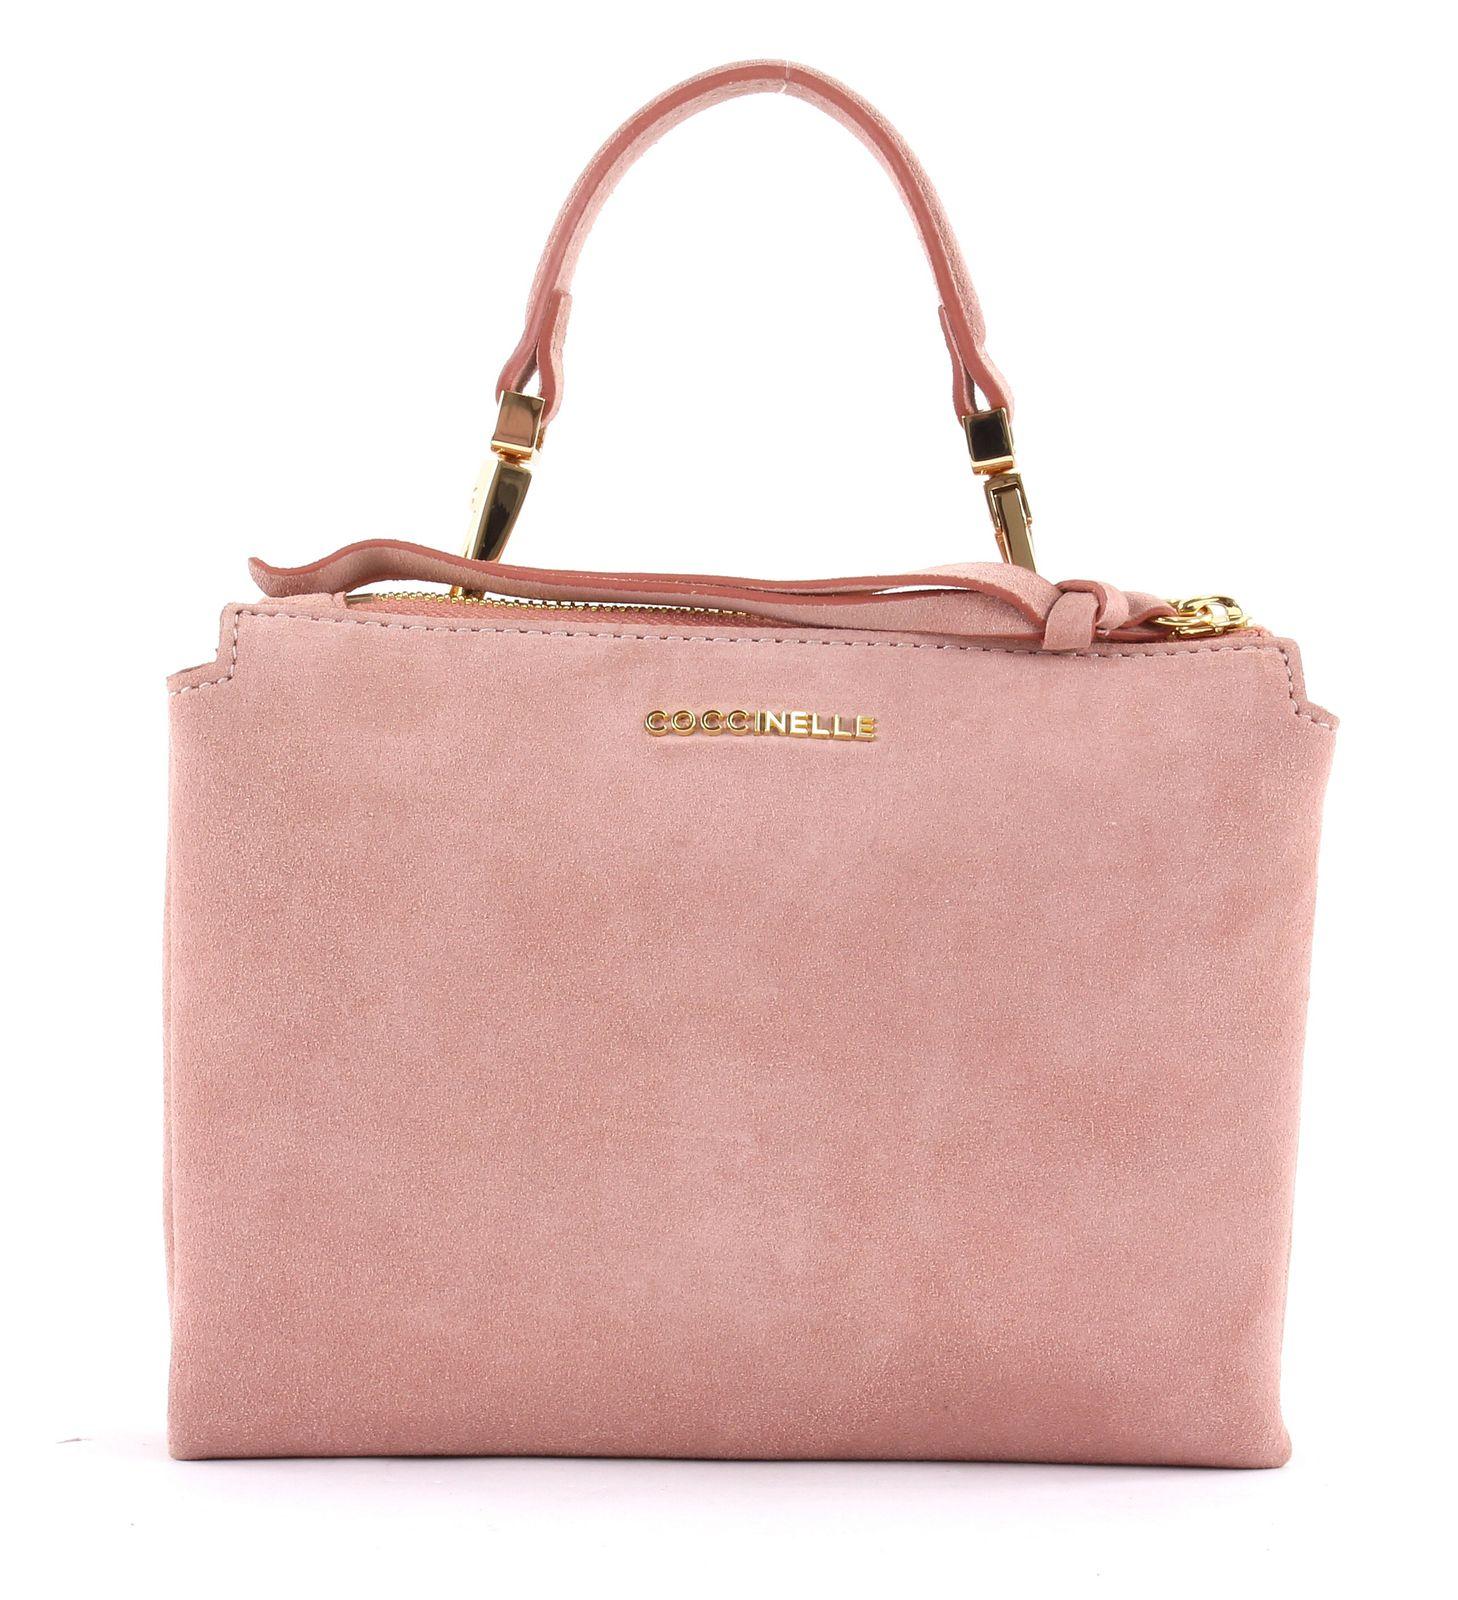 on wholesale so cheap classic fit COCCINELLE Arlettis Suede Small Handbag Pivoine